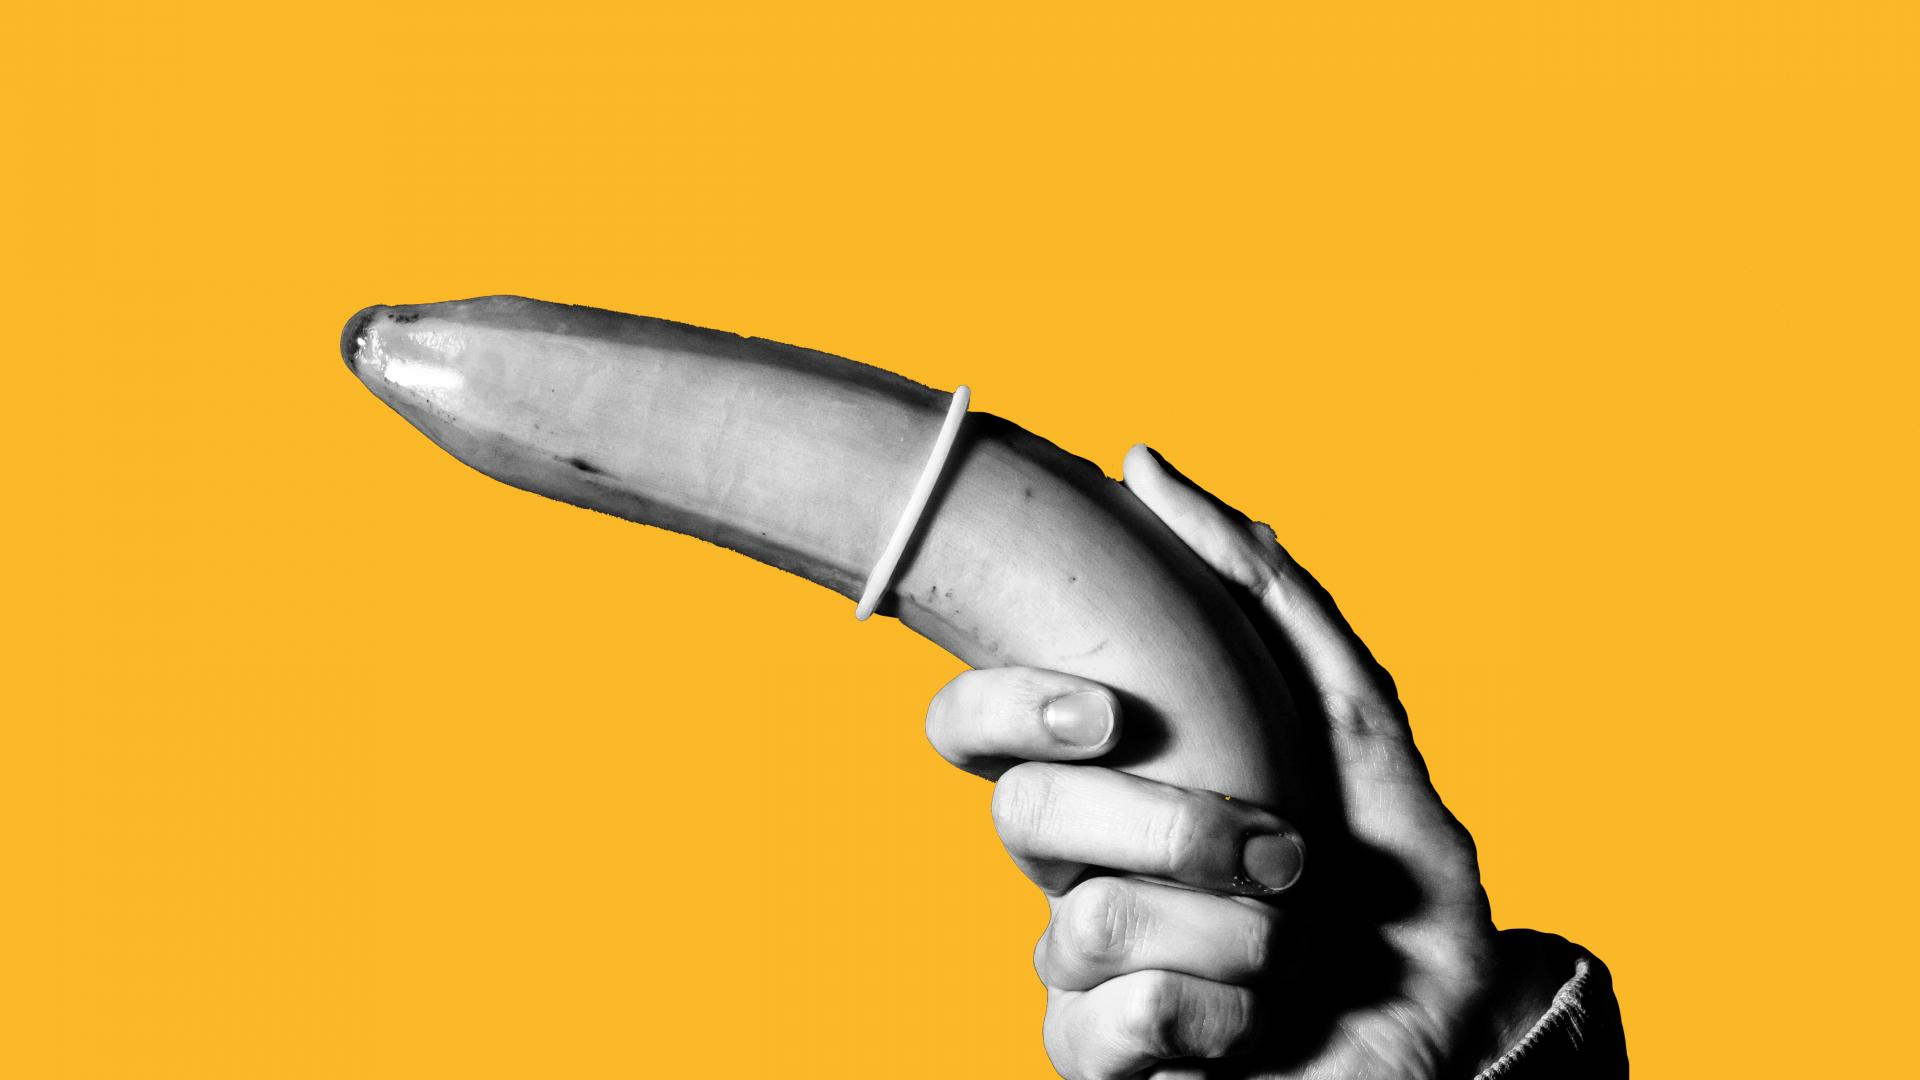 Kondom Banane